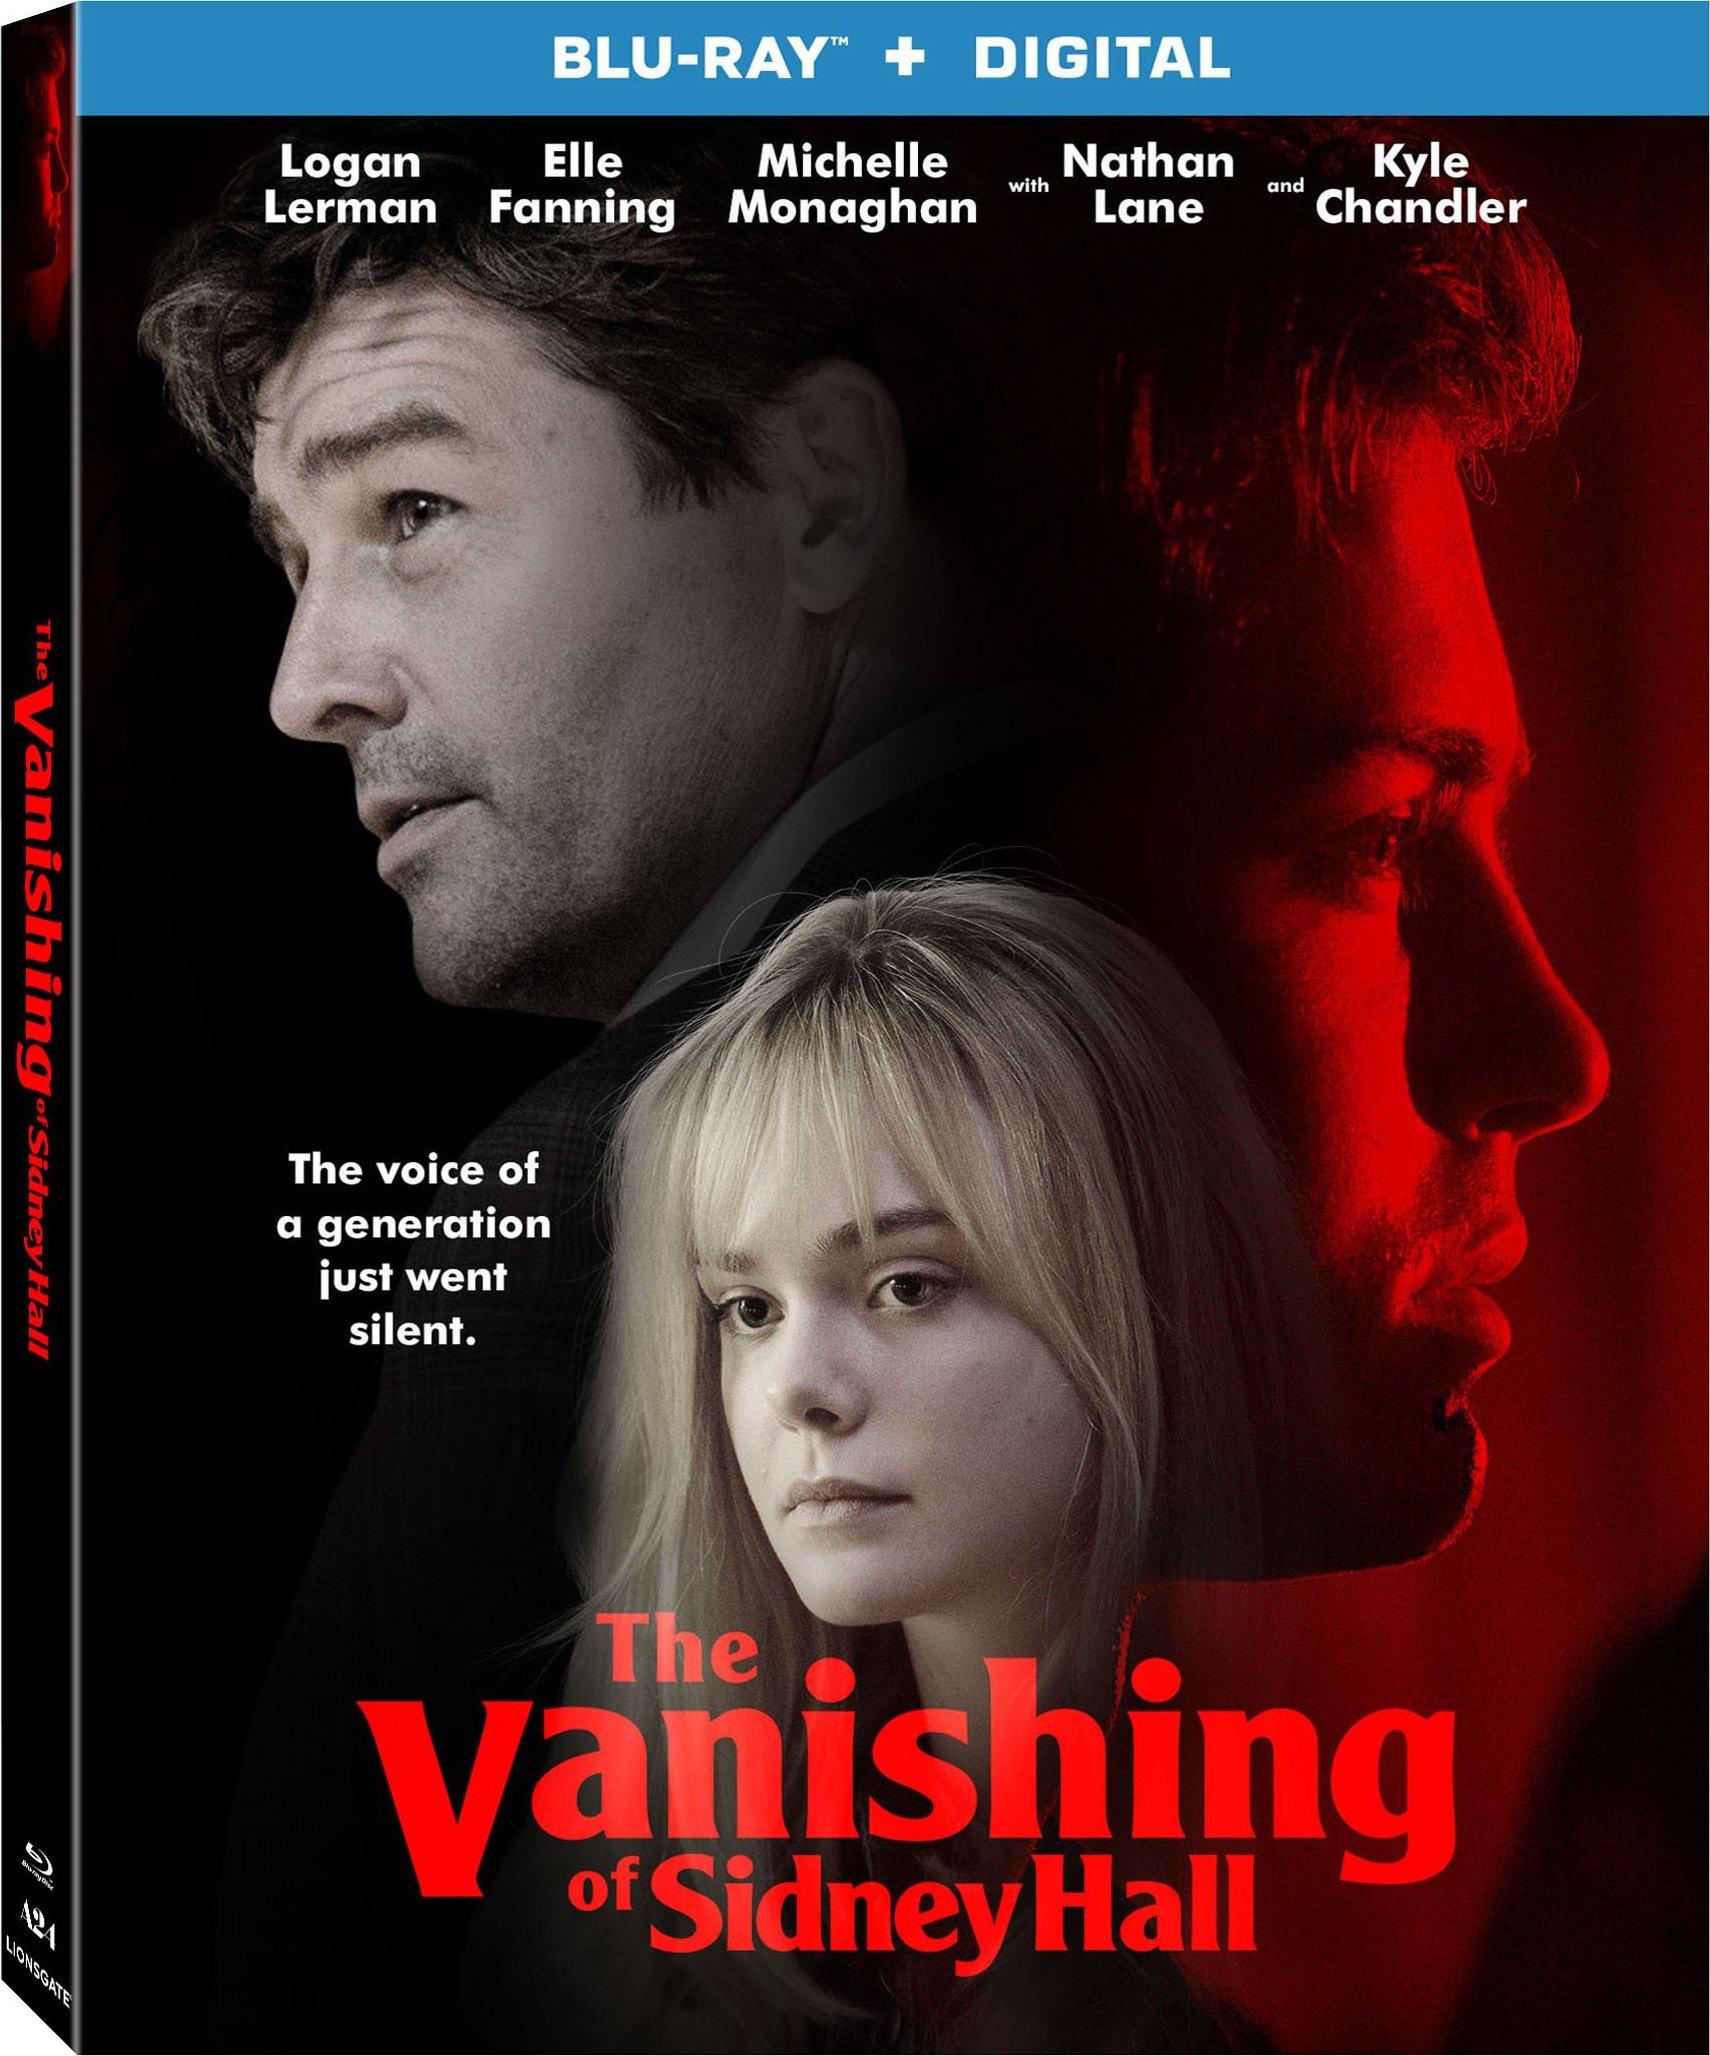 The Vanishing of Sidney Hall (2017) Blu-ray